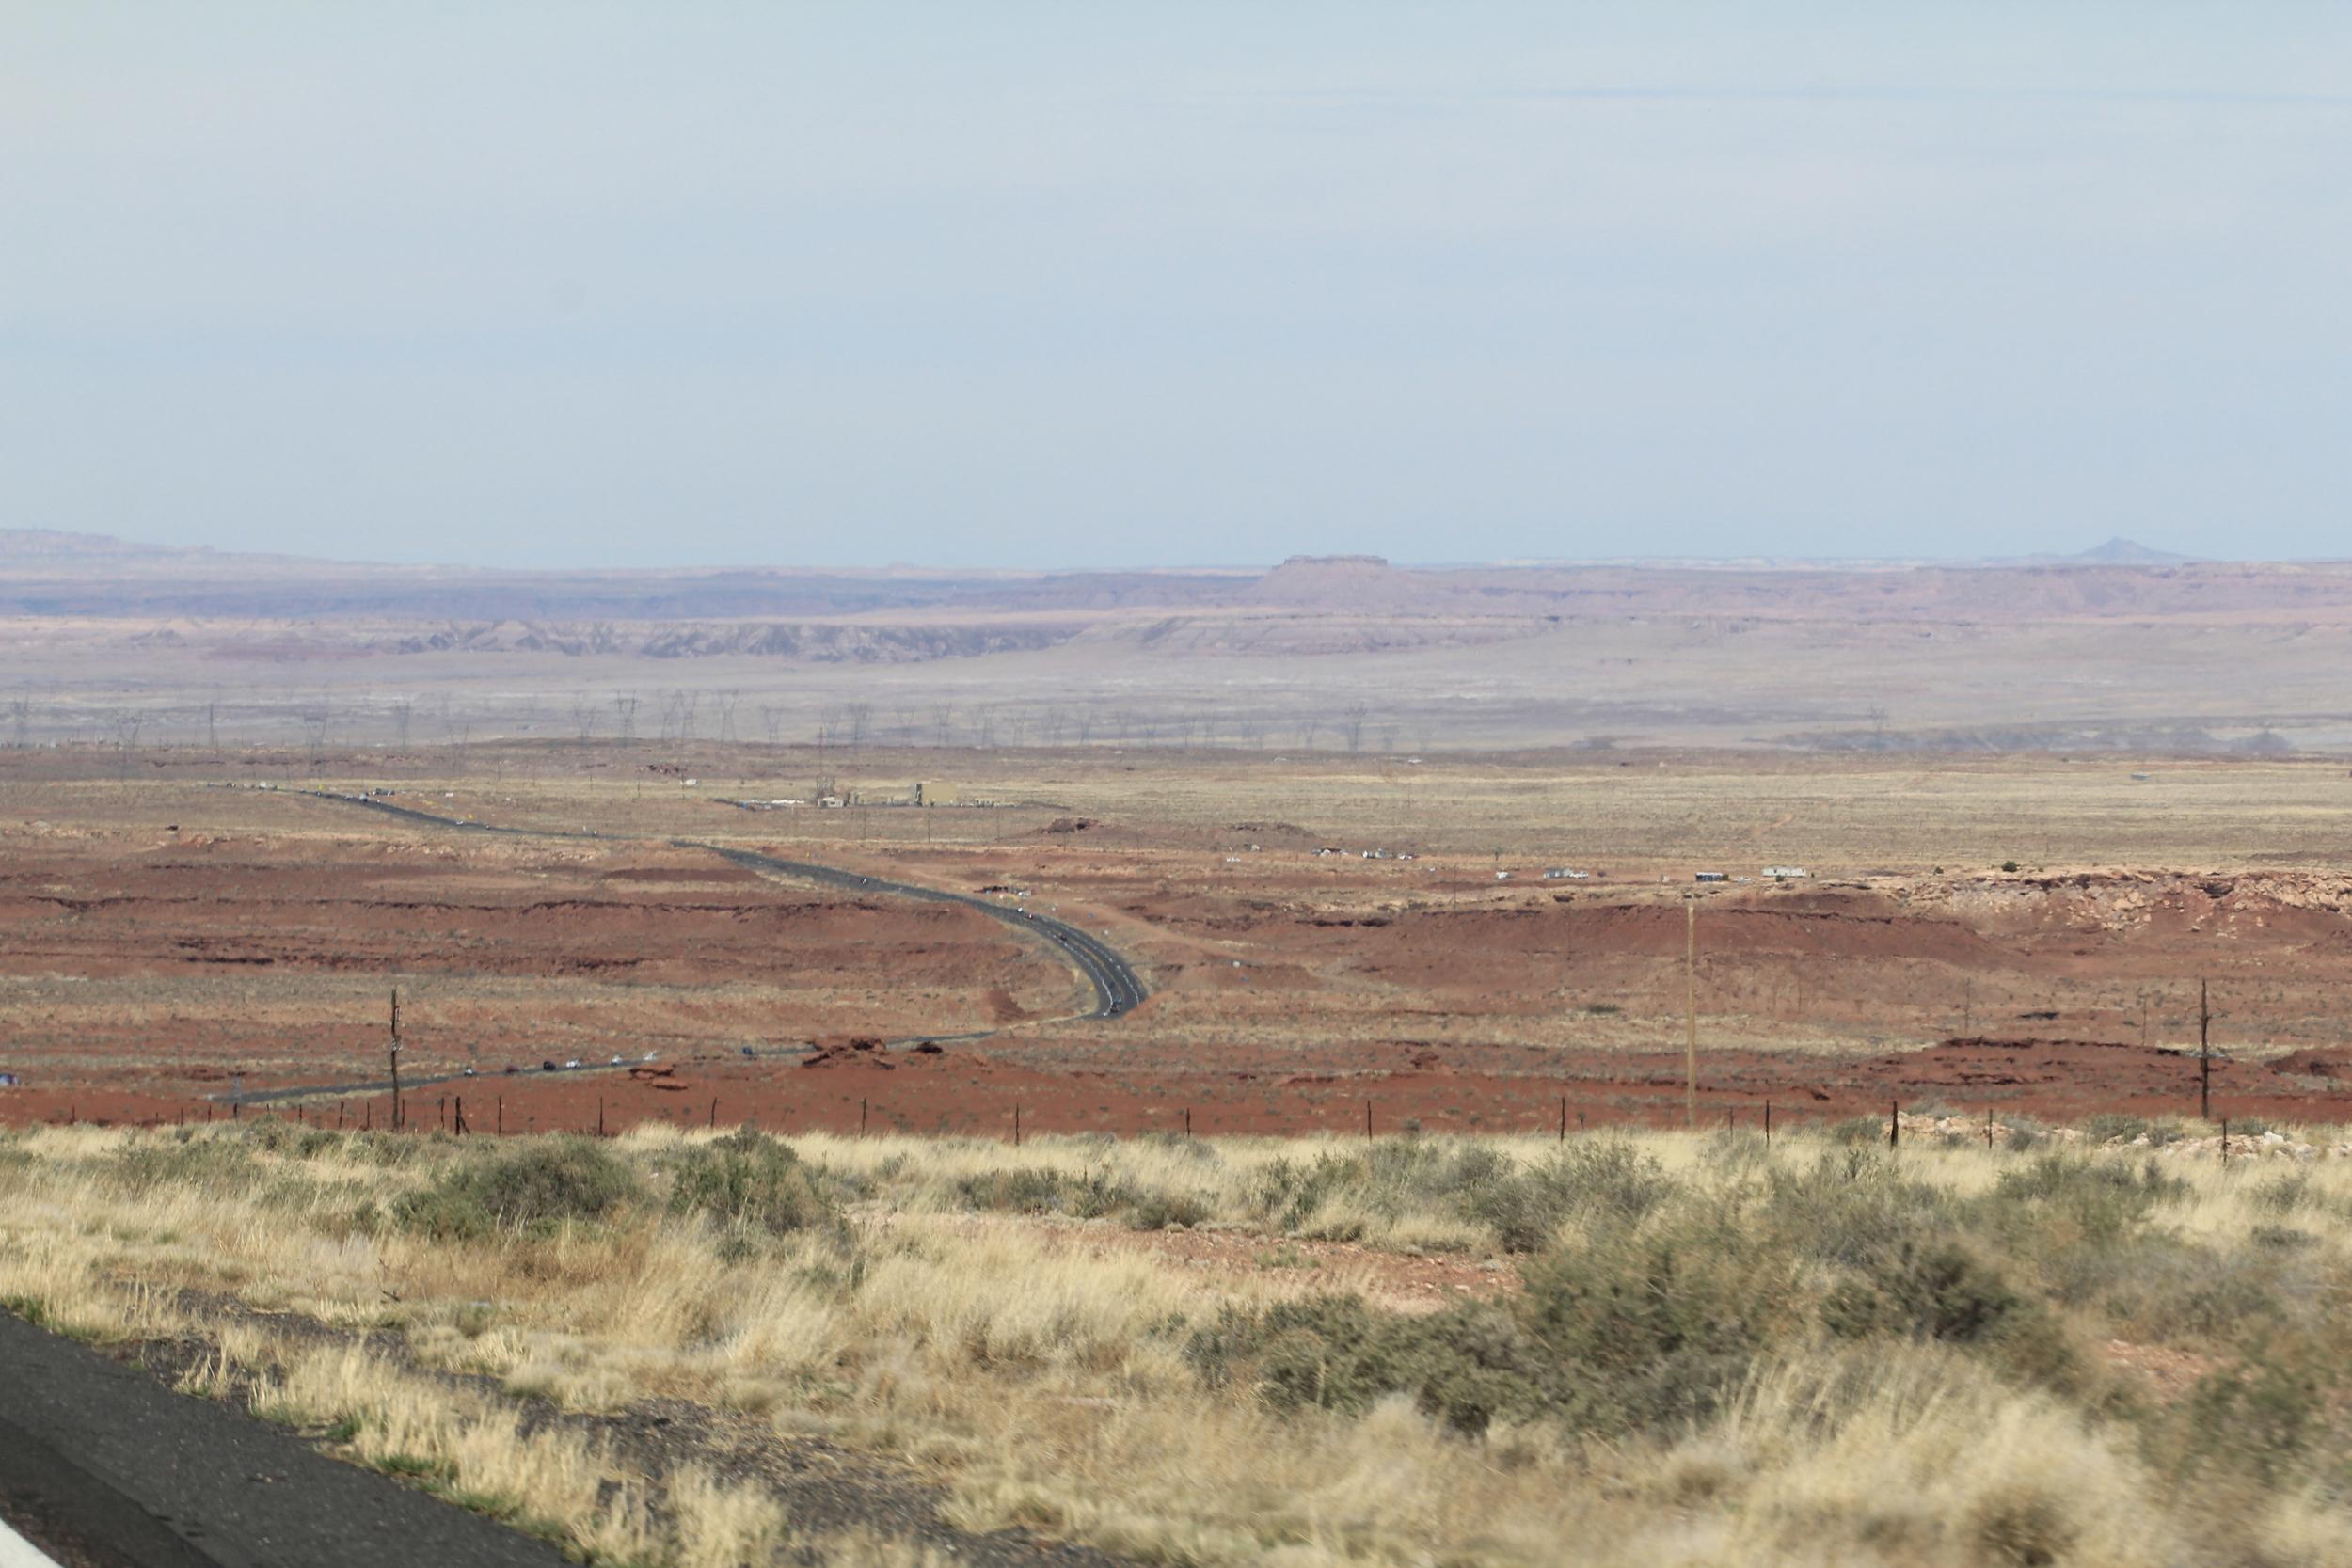 Arizona Reservations, Jon Courville Photography